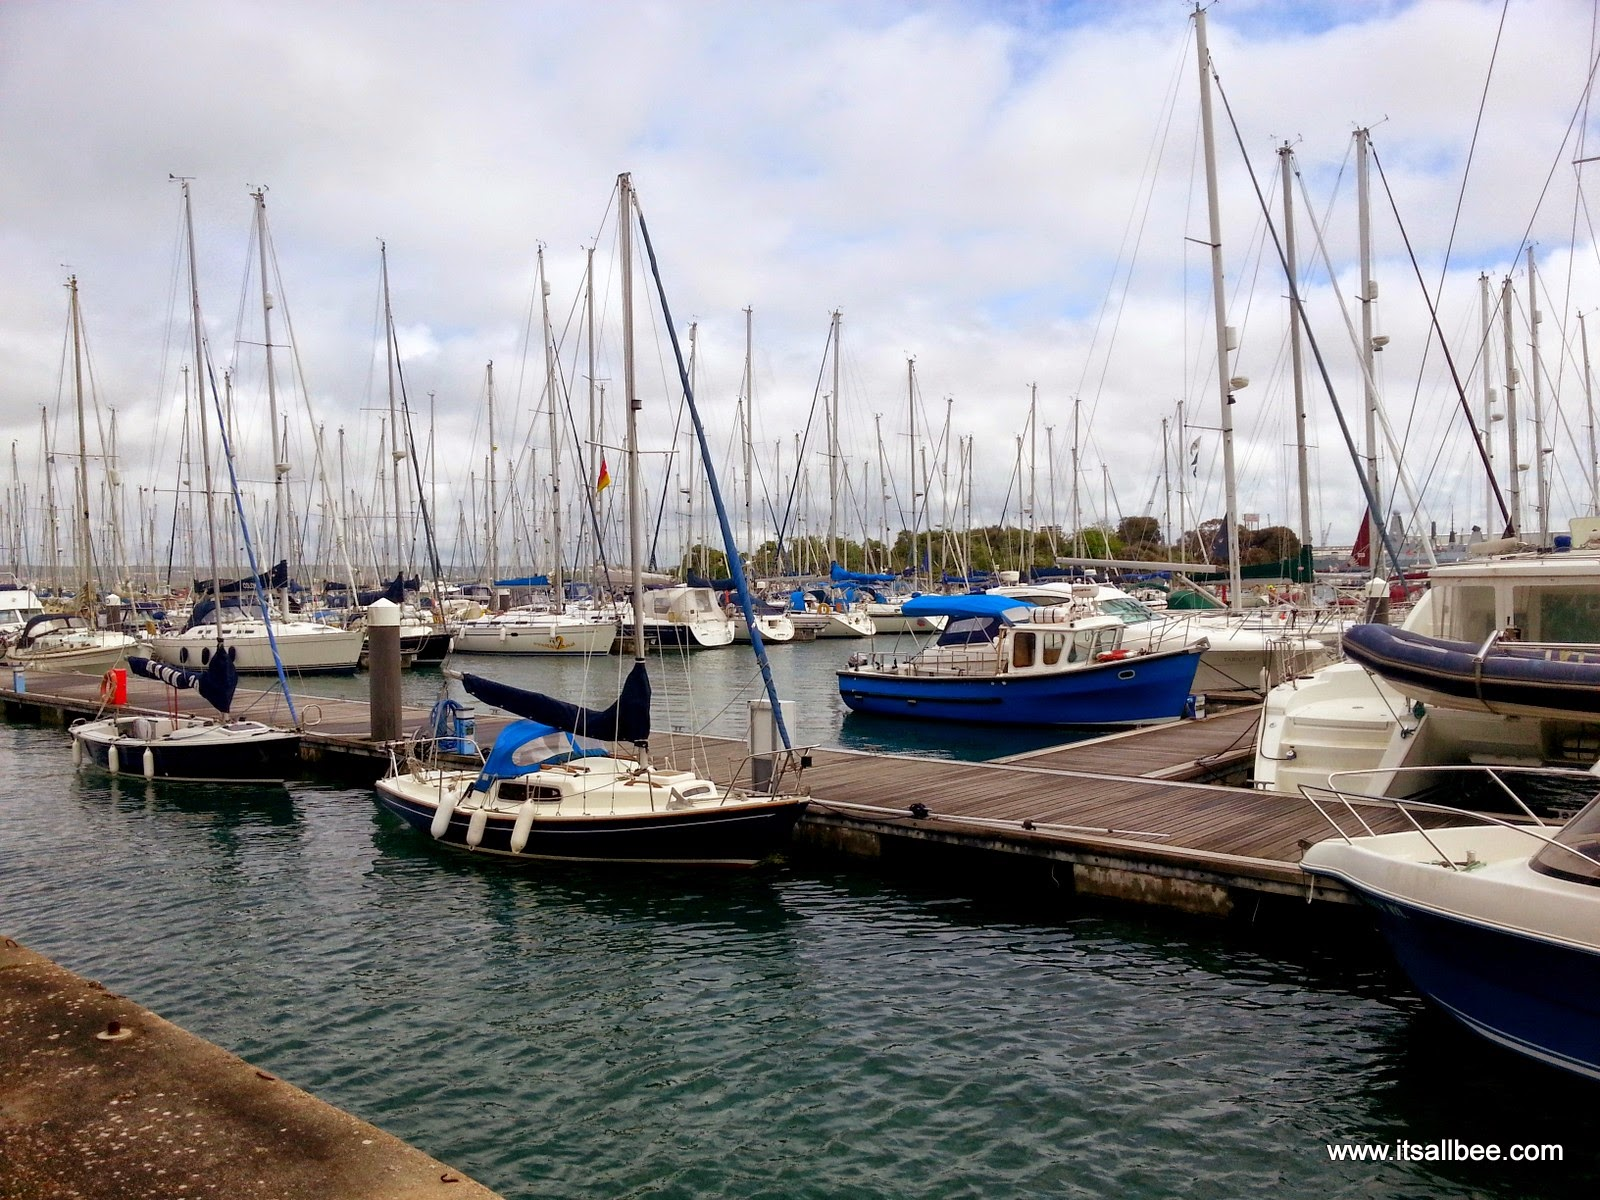 Portsea Island